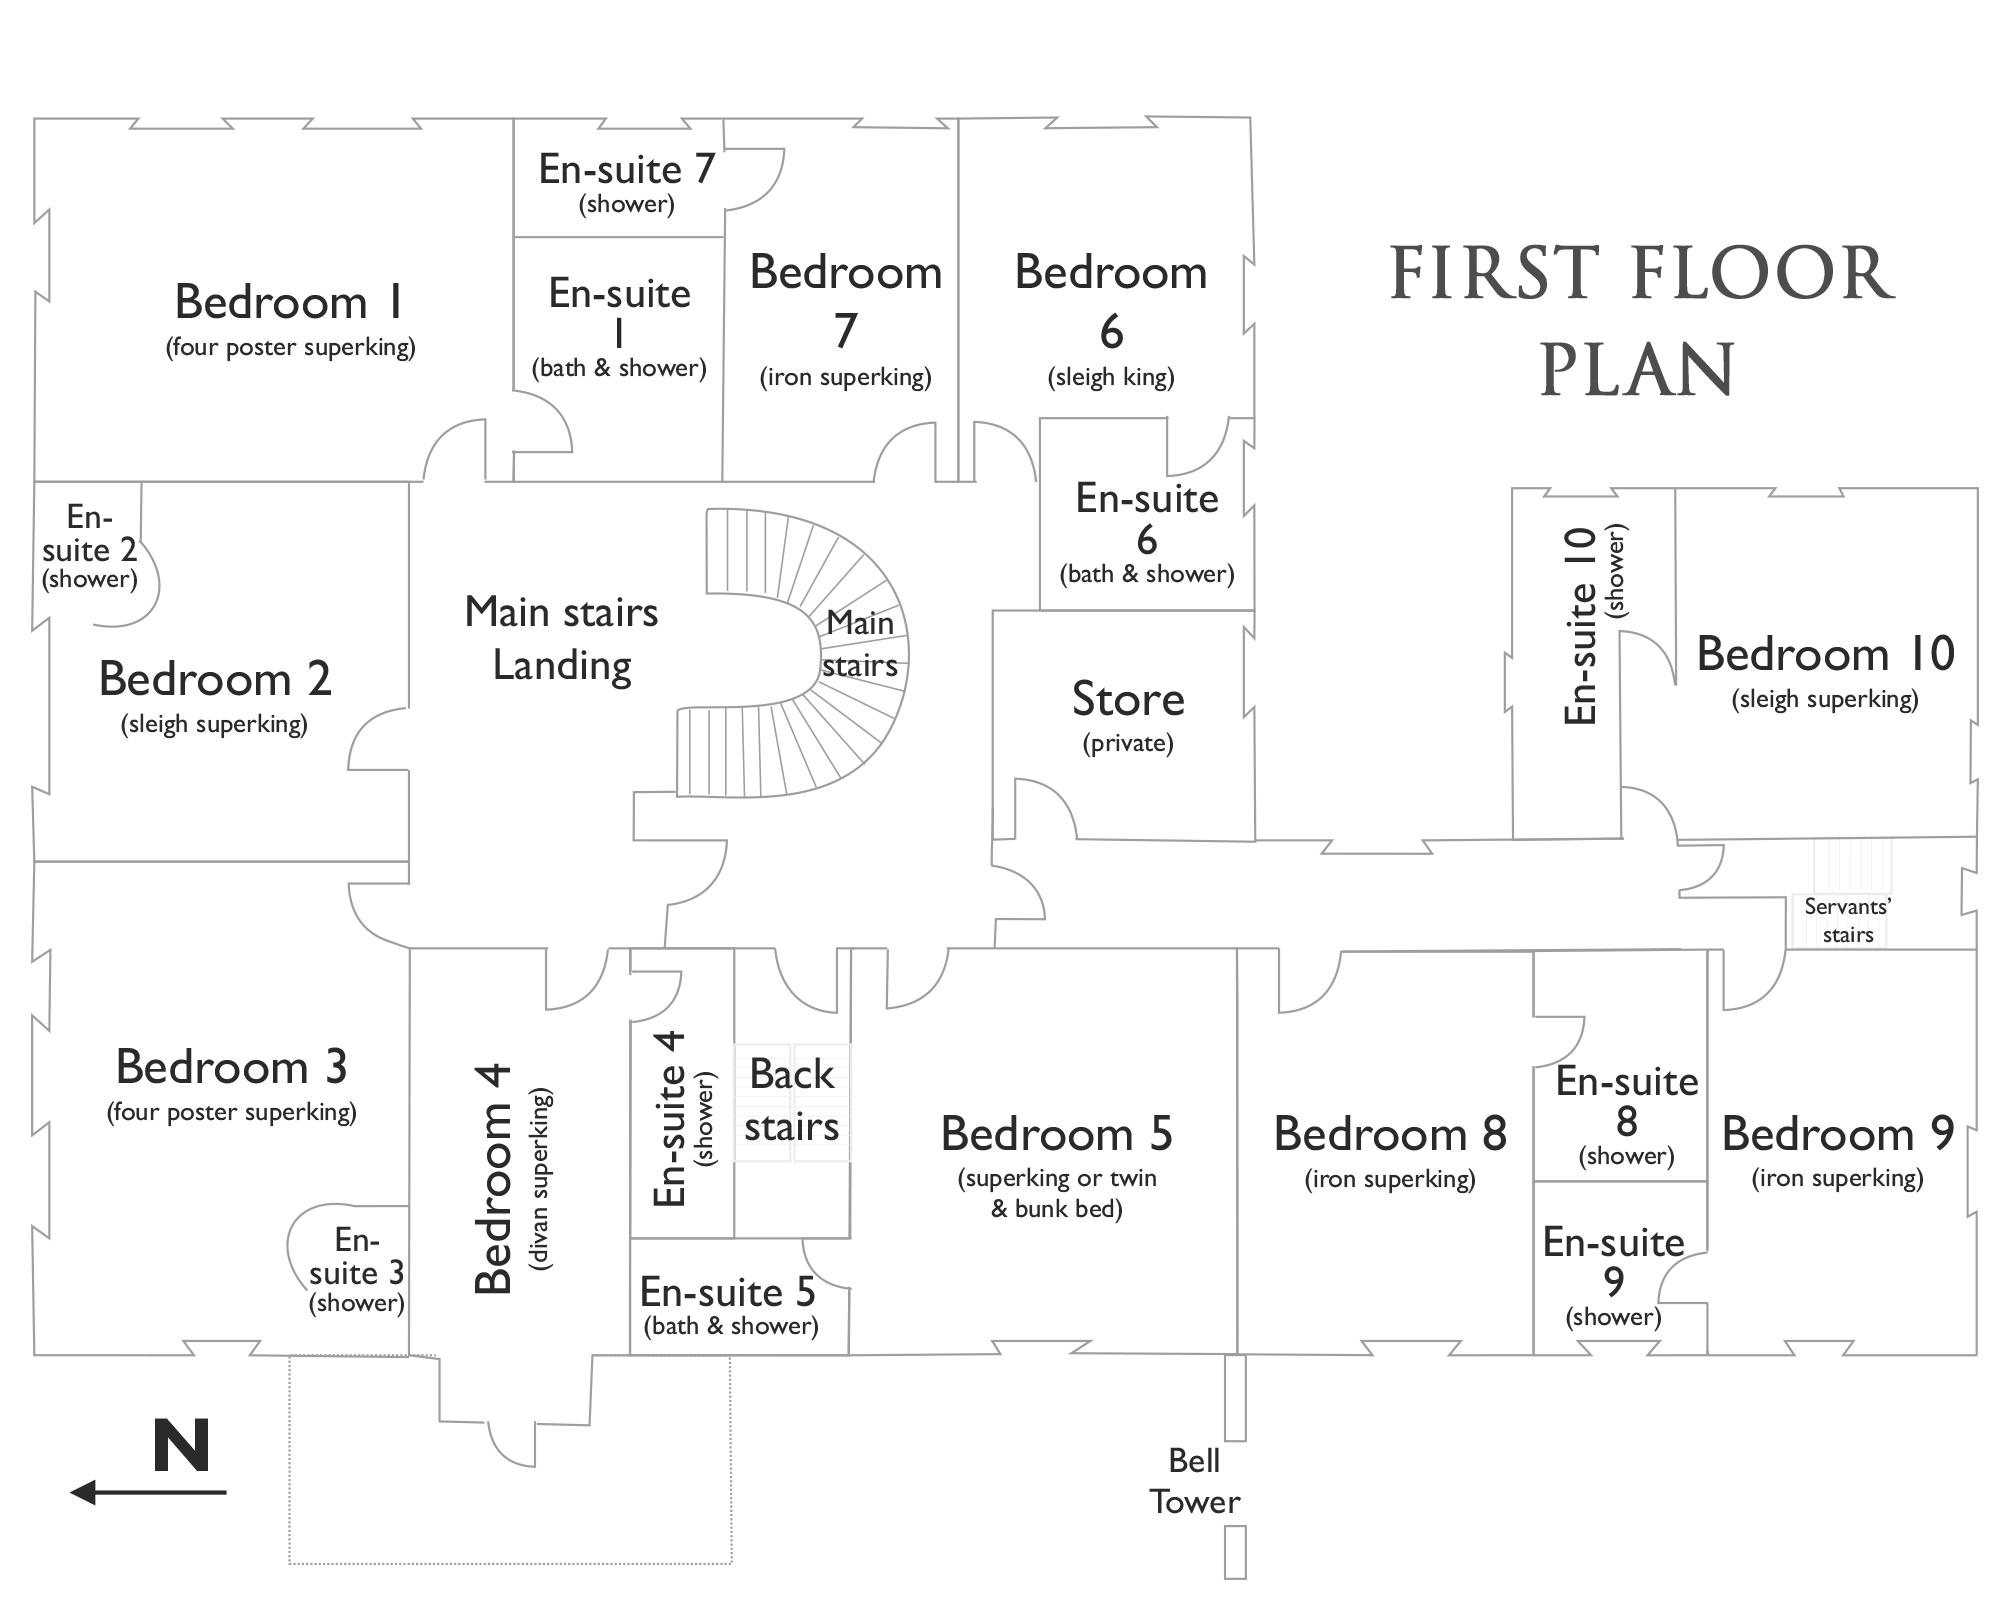 Hallsannery House First Floor Plan